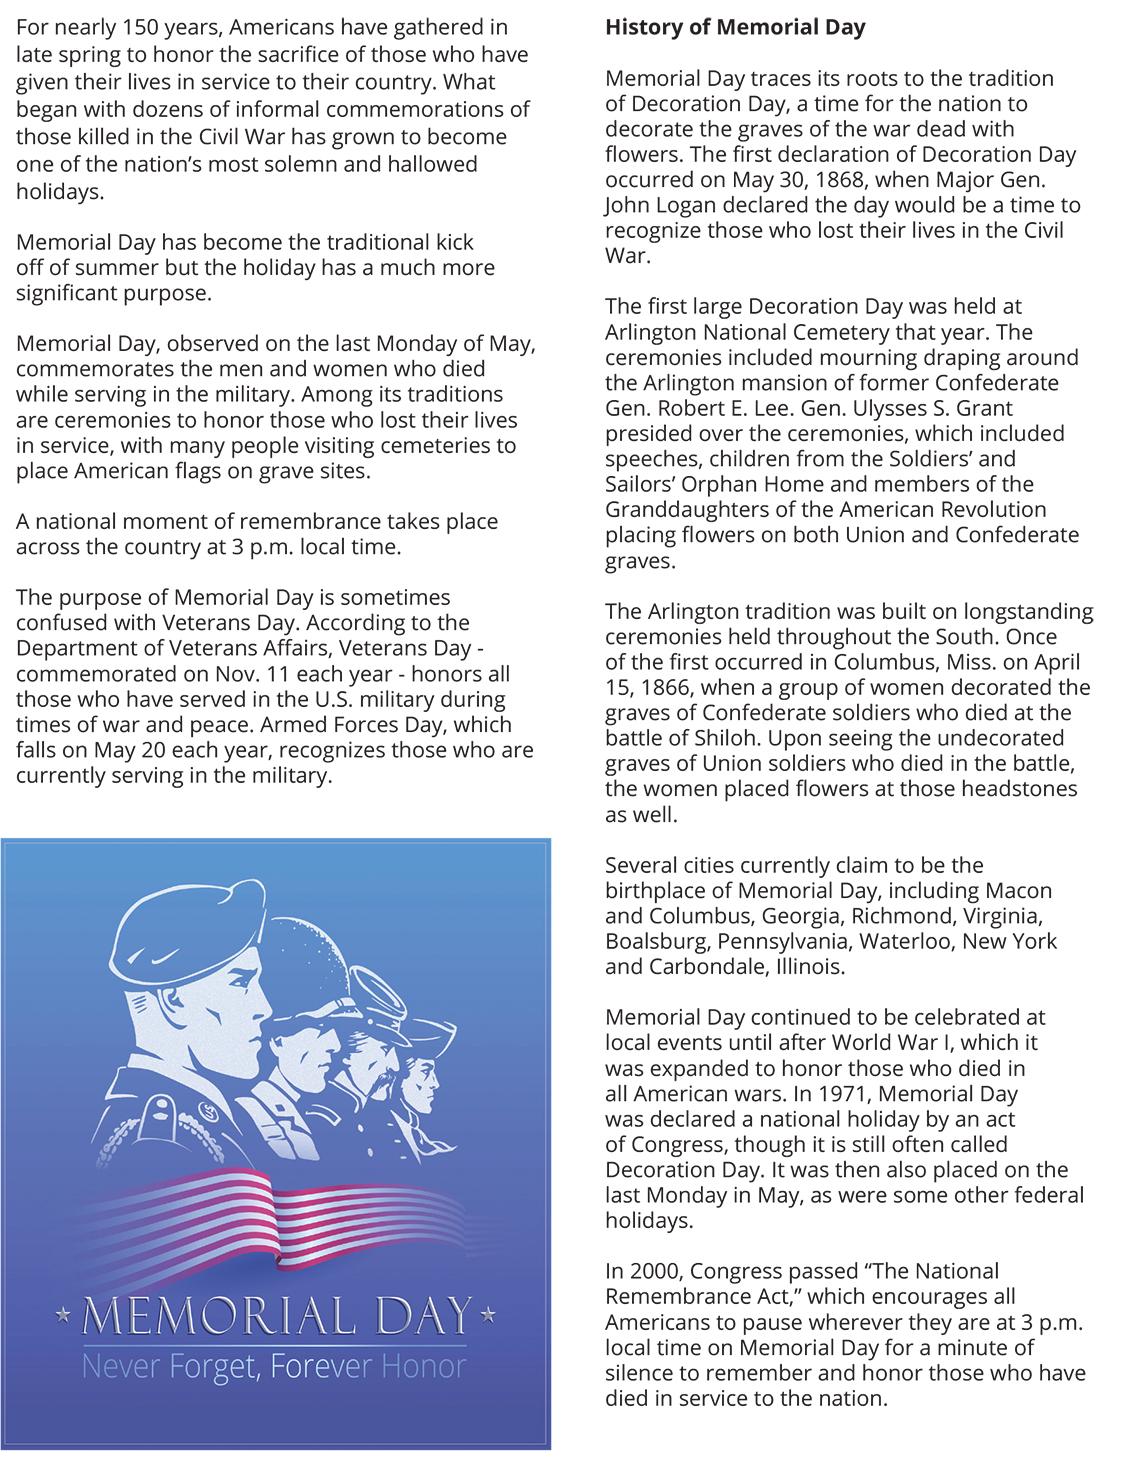 http://sandiegoveteransmagazine.com/wp-content/uploads/2020/05/San-Diego-Veterans-May-2020-Diff2.jpg